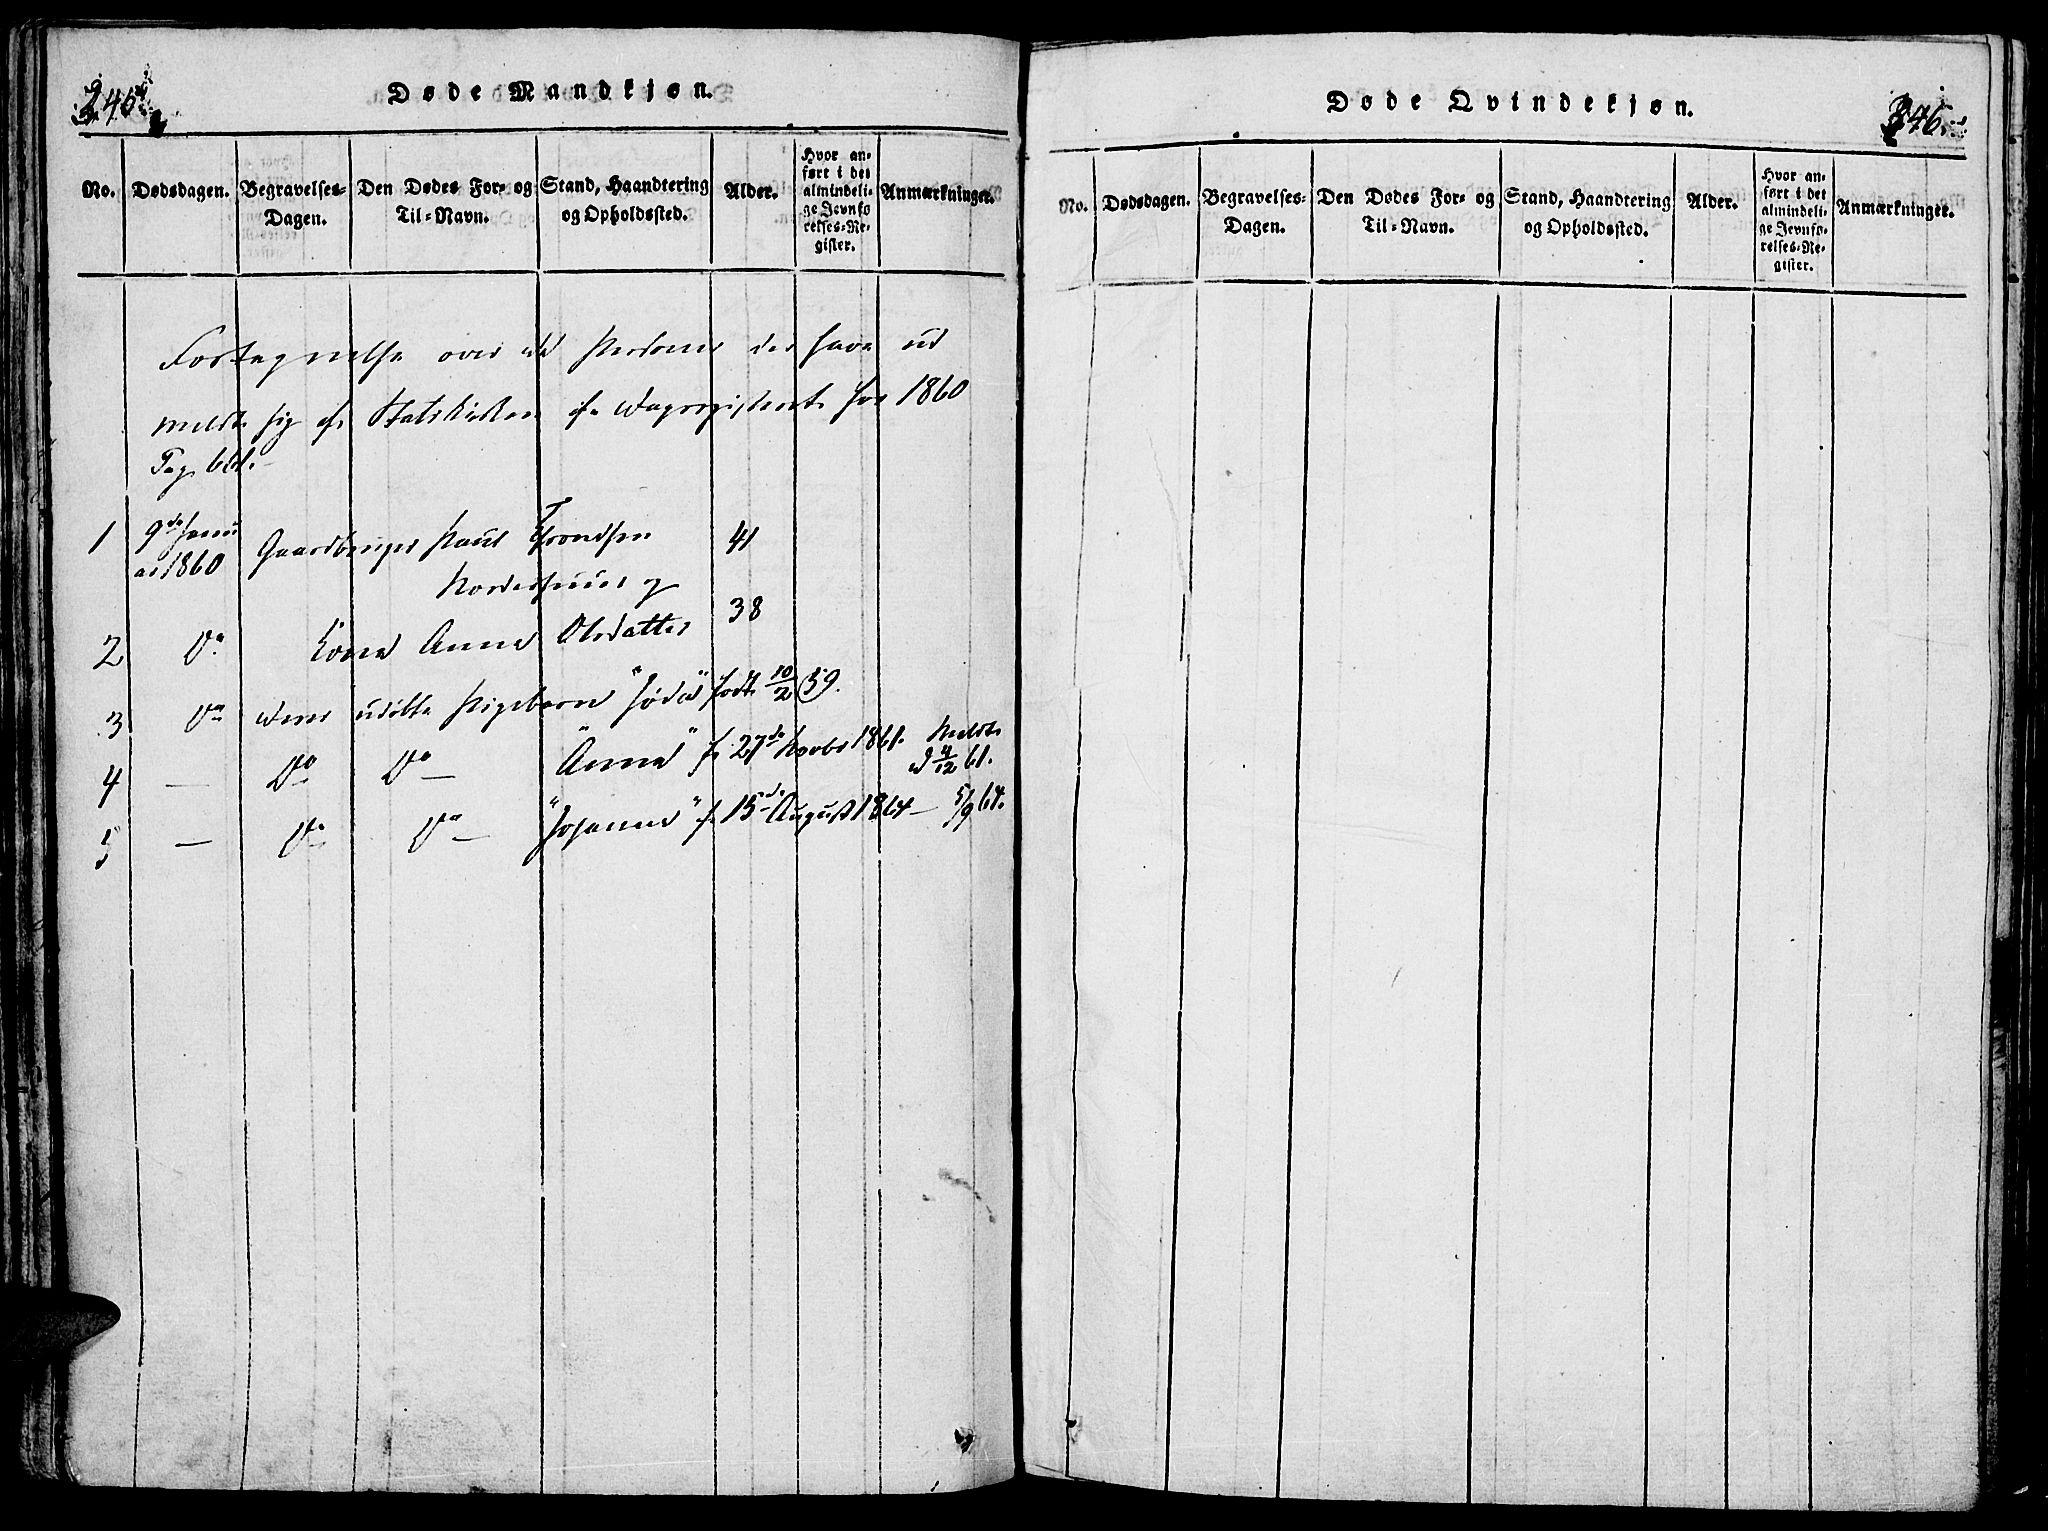 SAH, Lesja prestekontor, Ministerialbok nr. 4, 1820-1829, s. 345-346